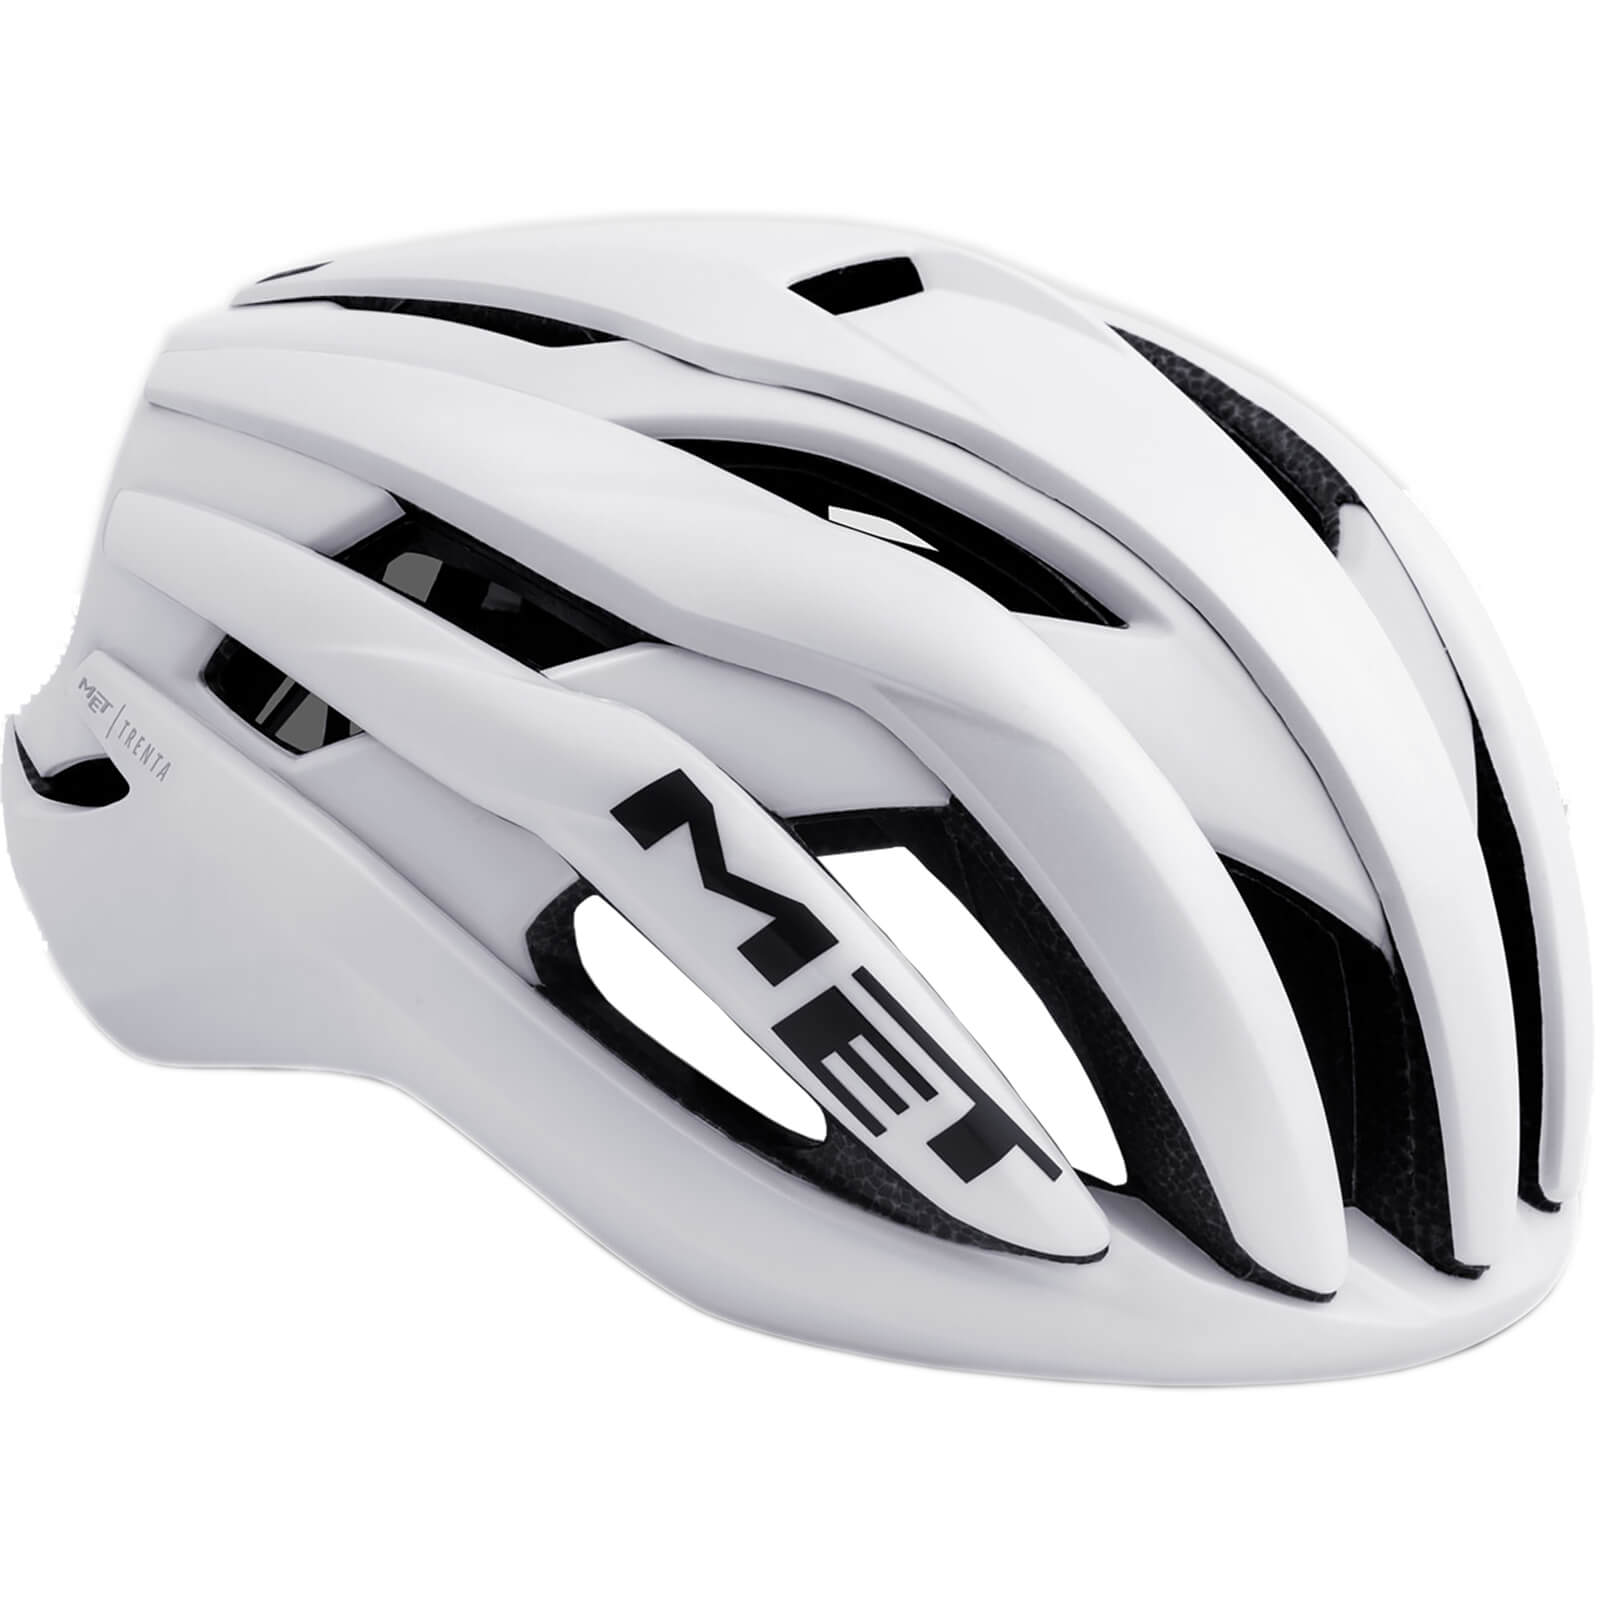 Met Trenta Road Helmet - S/52-56cm - White